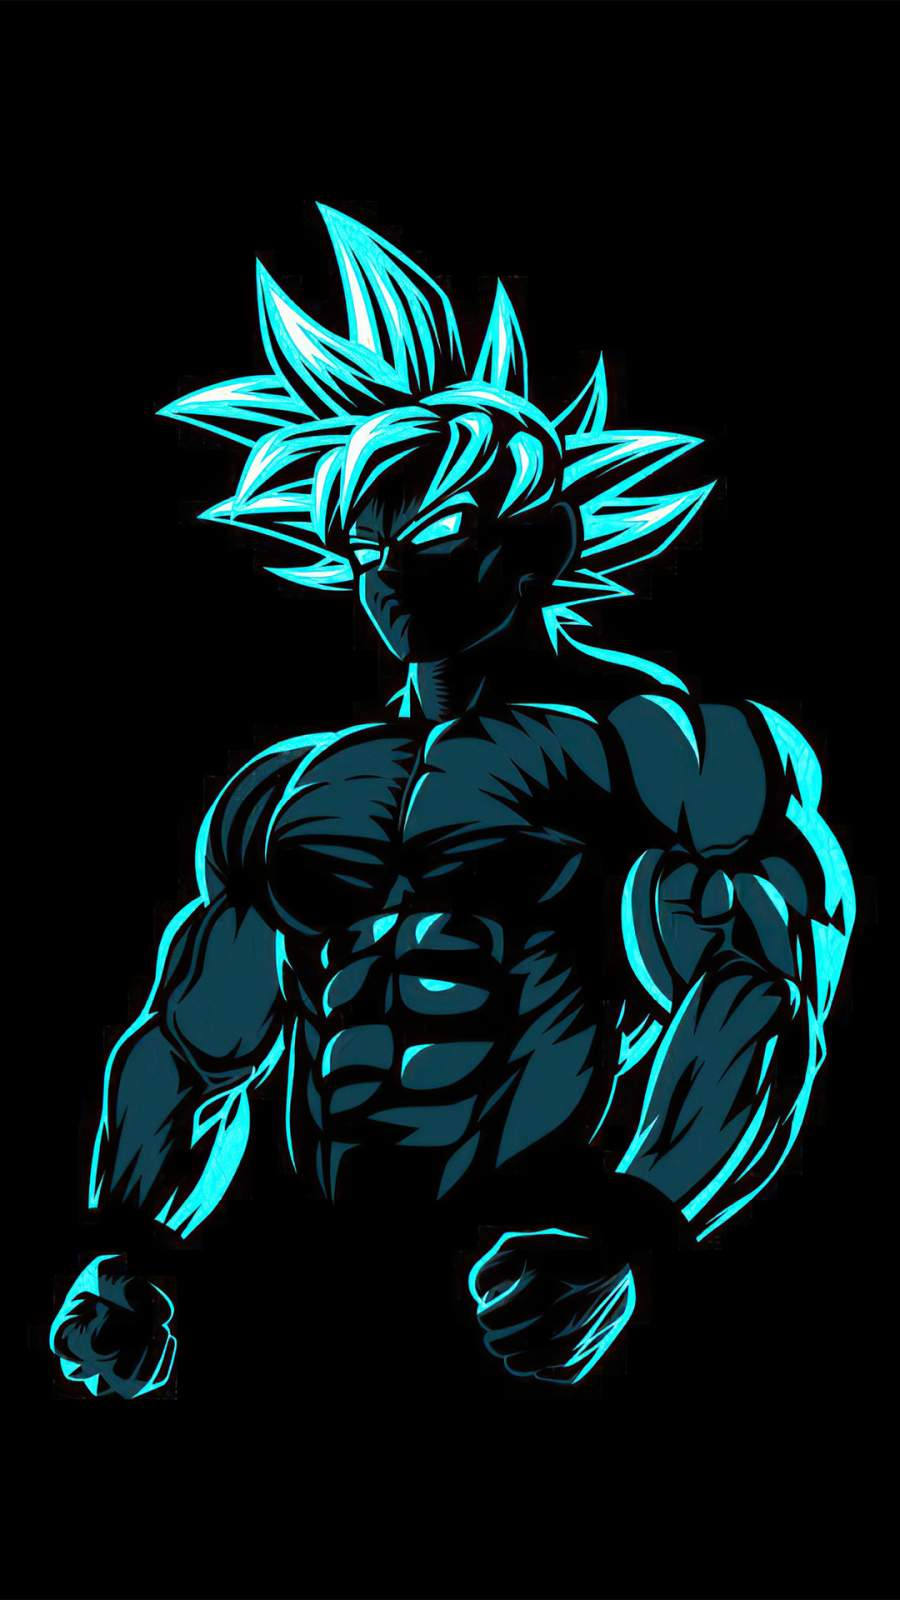 Goku Beast iPhone Wallpaper